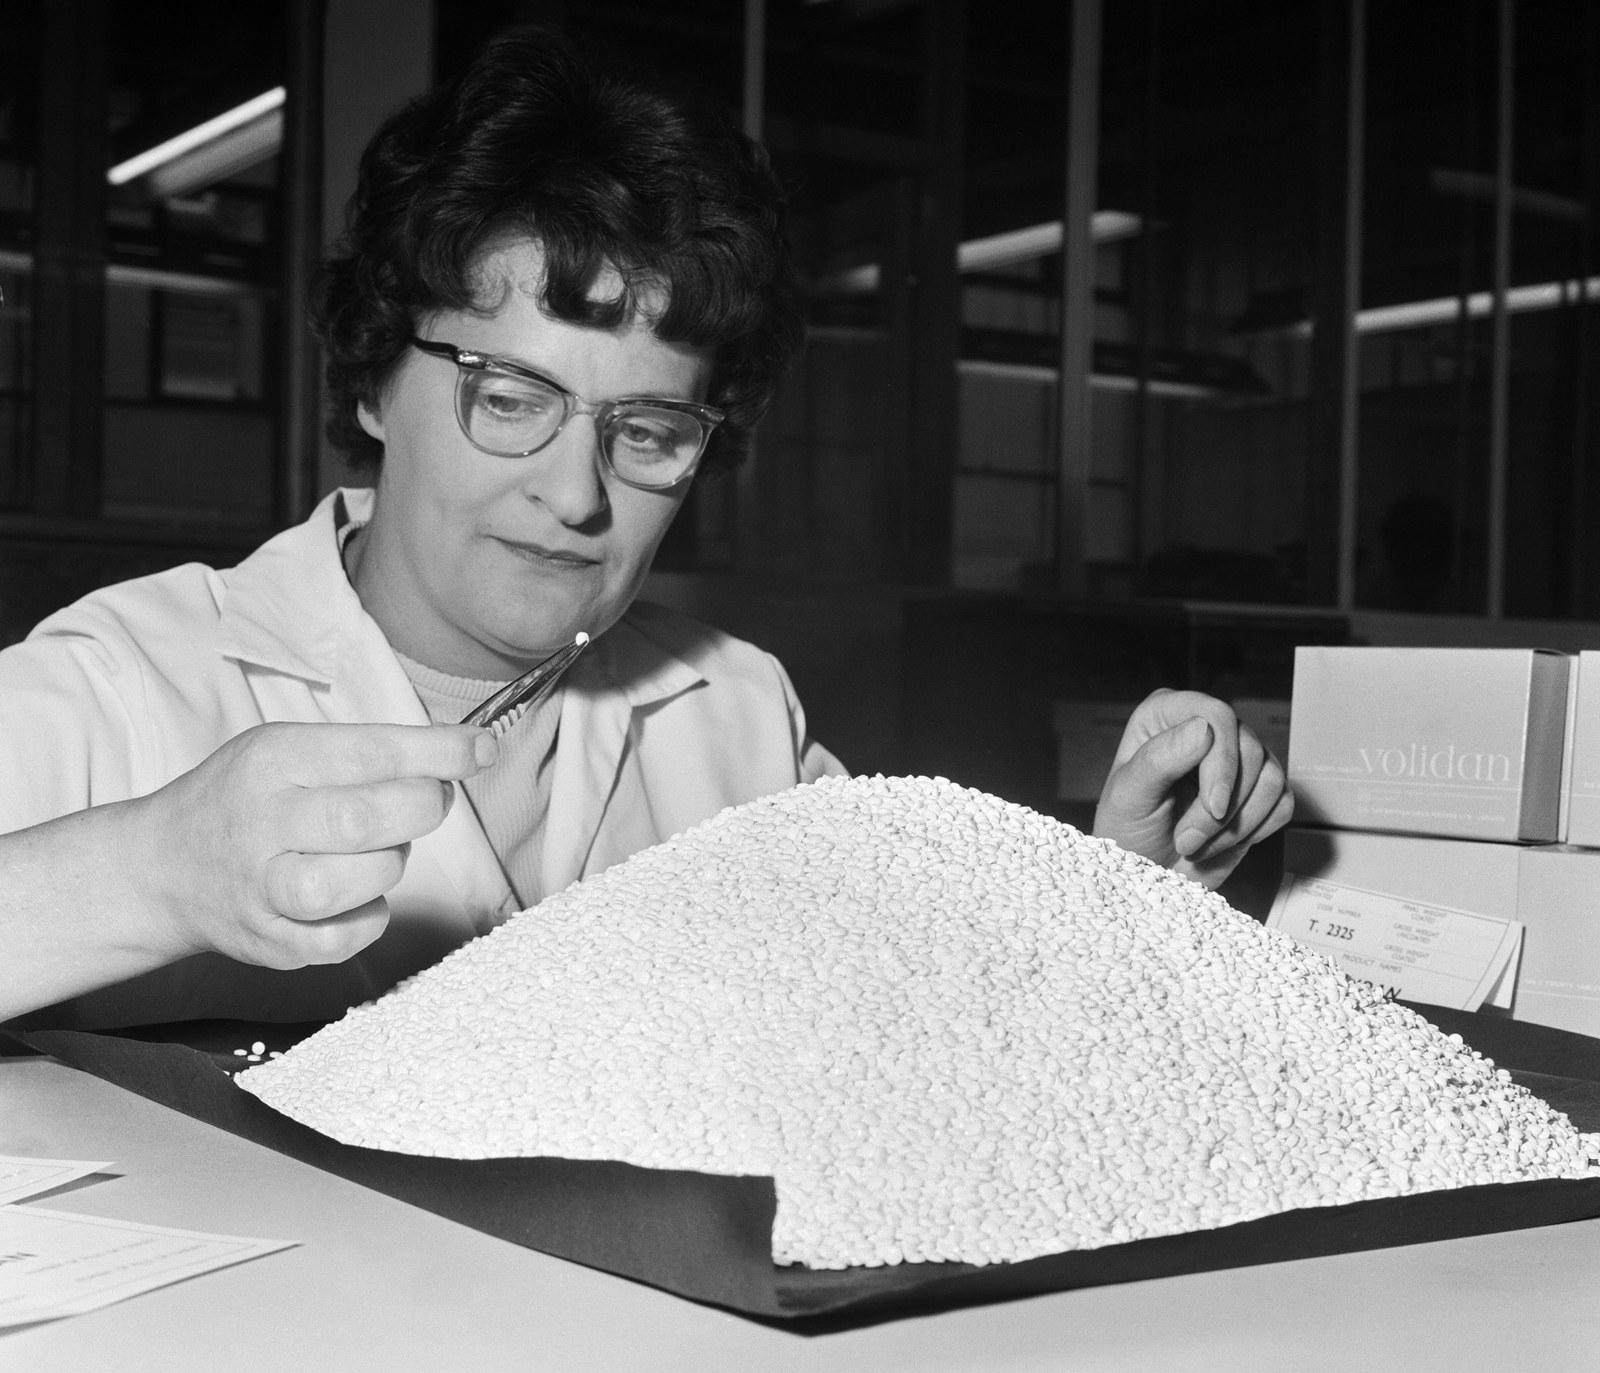 A pharmacist sorts 150,000 Volidan birth control pills in London on Aug. 17, 1965.